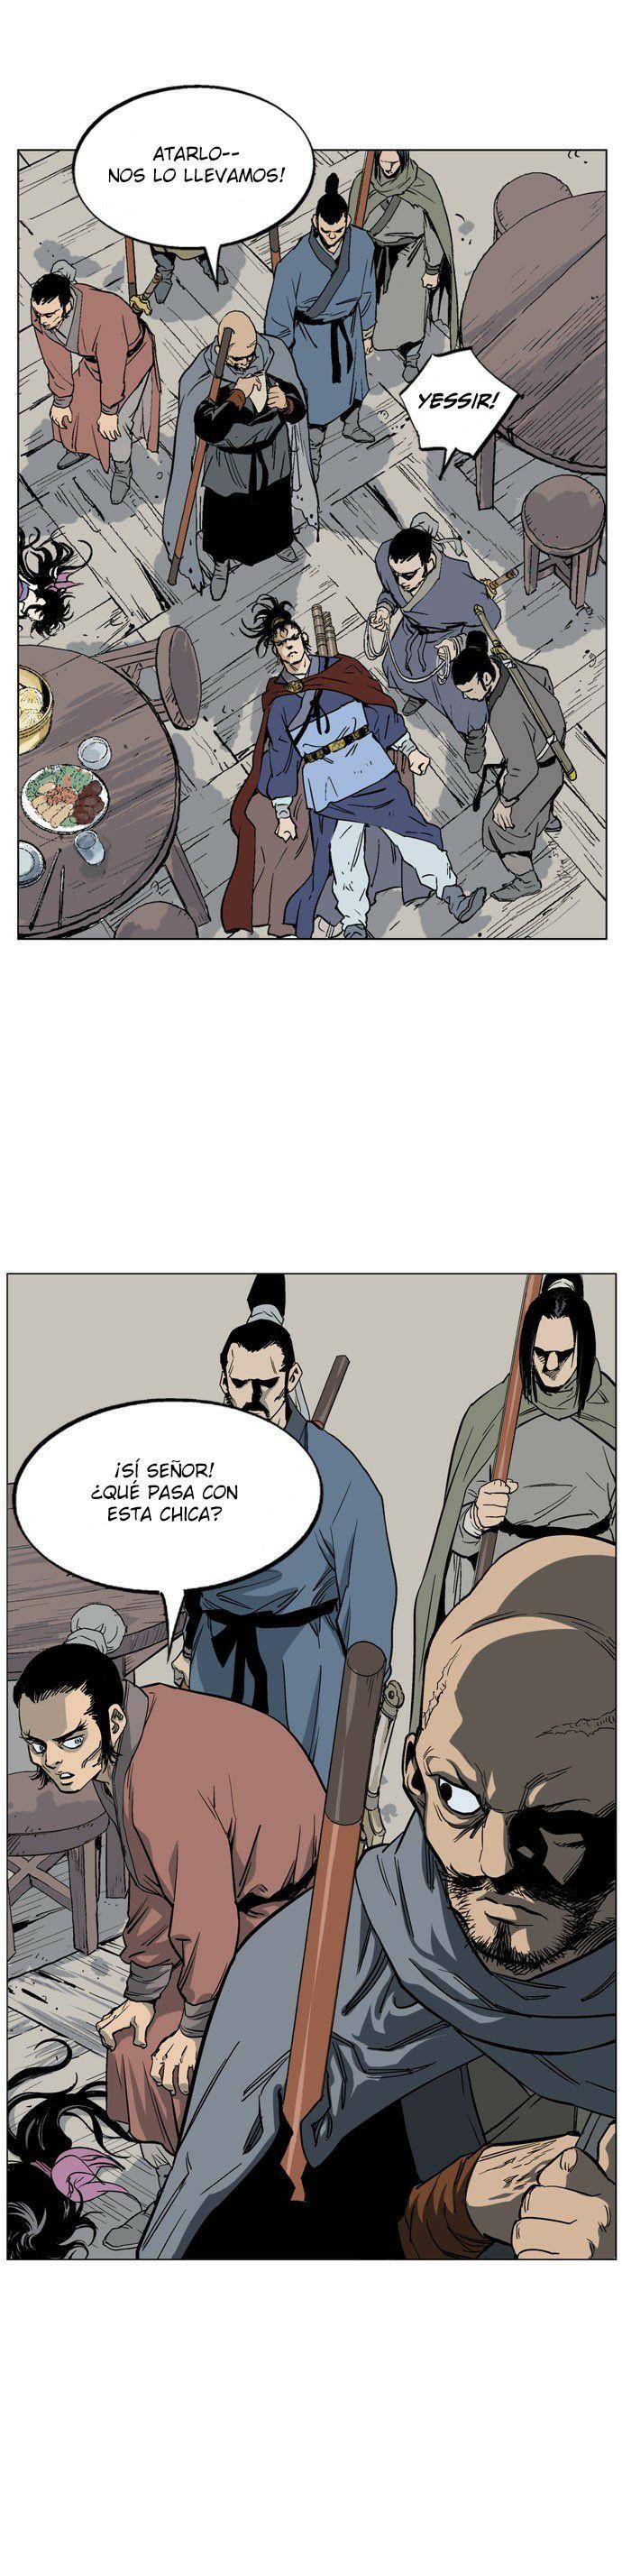 https://c5.ninemanga.com/es_manga/pic2/9/18249/512506/47ce198d2acdb8dfaaf0bf7bd09977d9.jpg Page 8